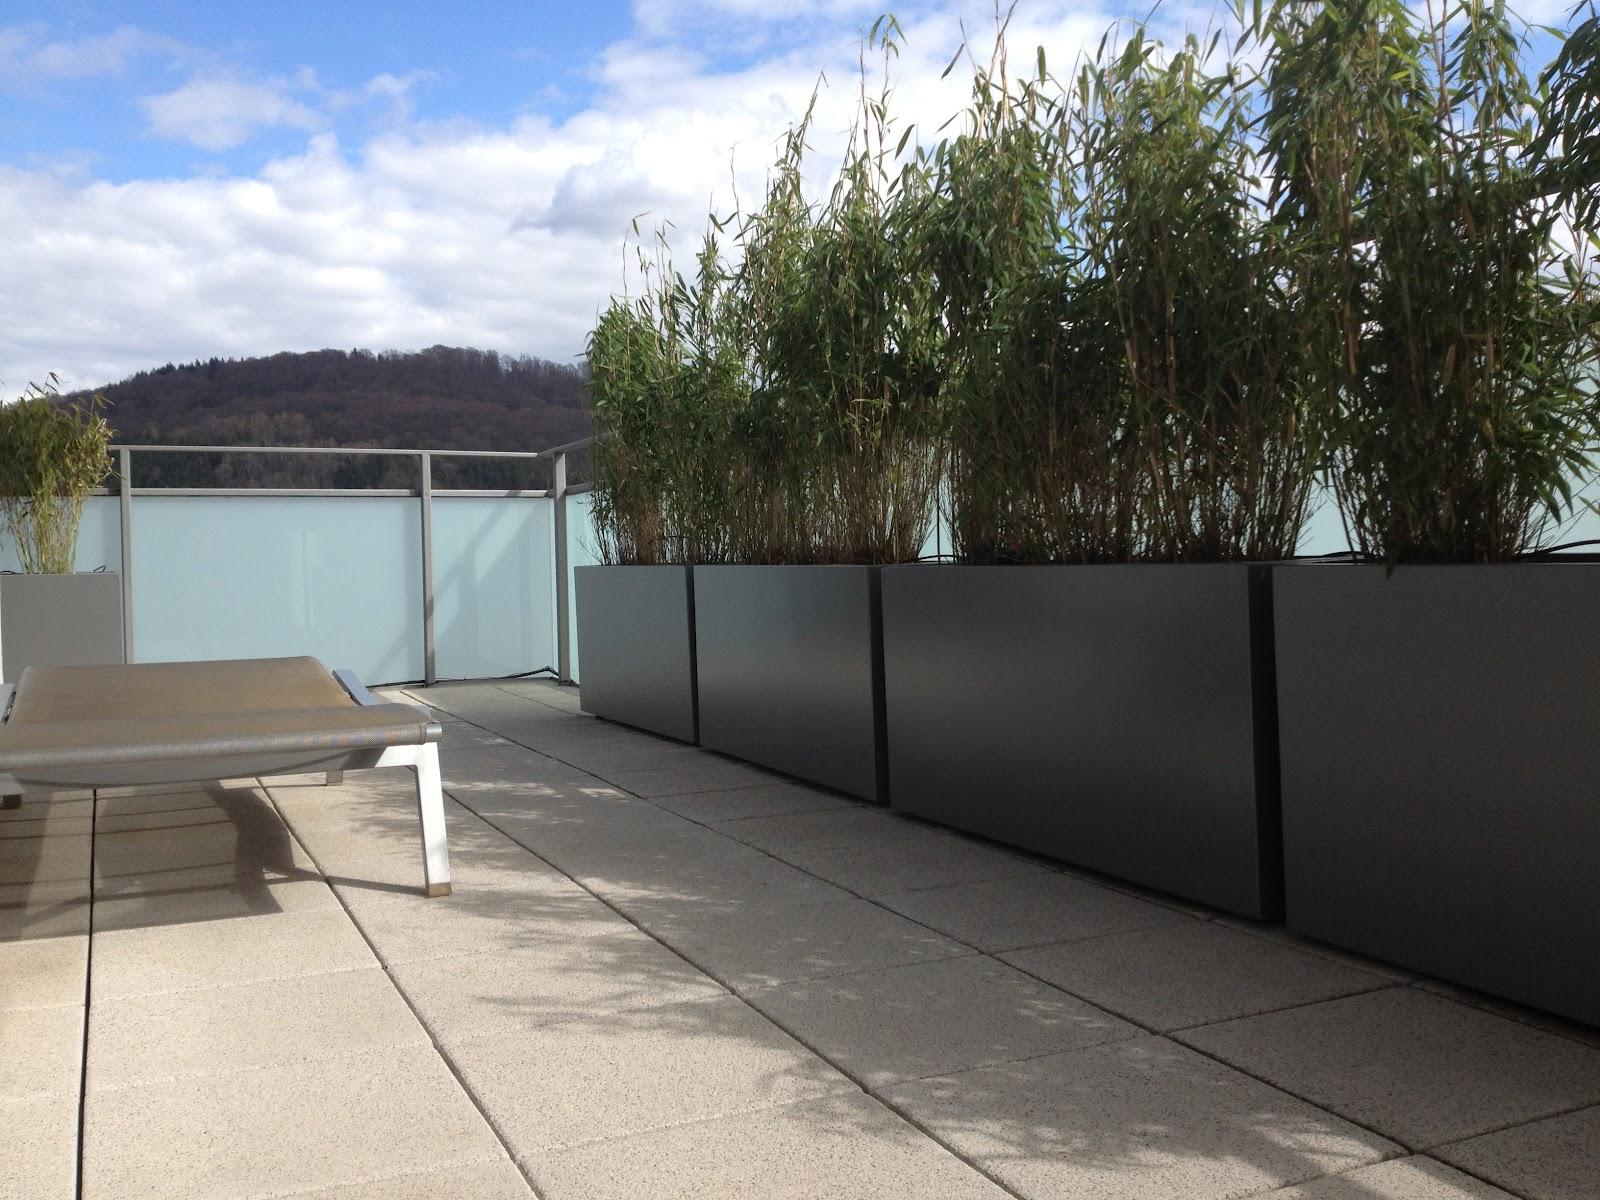 galerie photos bacs sur mesure image 39 in am nagement d 39 une terrasse luxembourgeoise. Black Bedroom Furniture Sets. Home Design Ideas